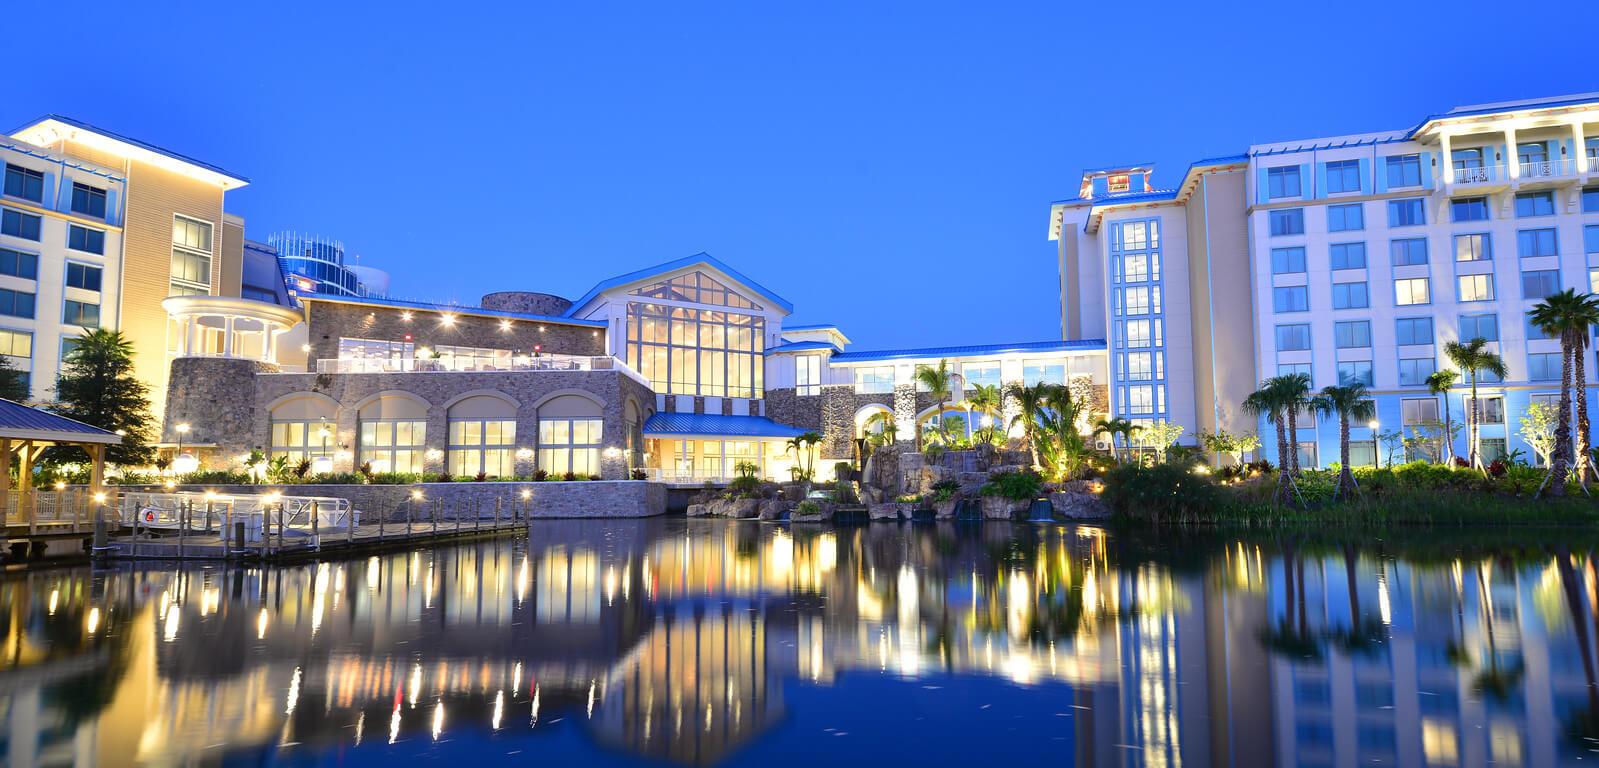 Loews-Sapphire-Falls-Resort-Universal-Orlando